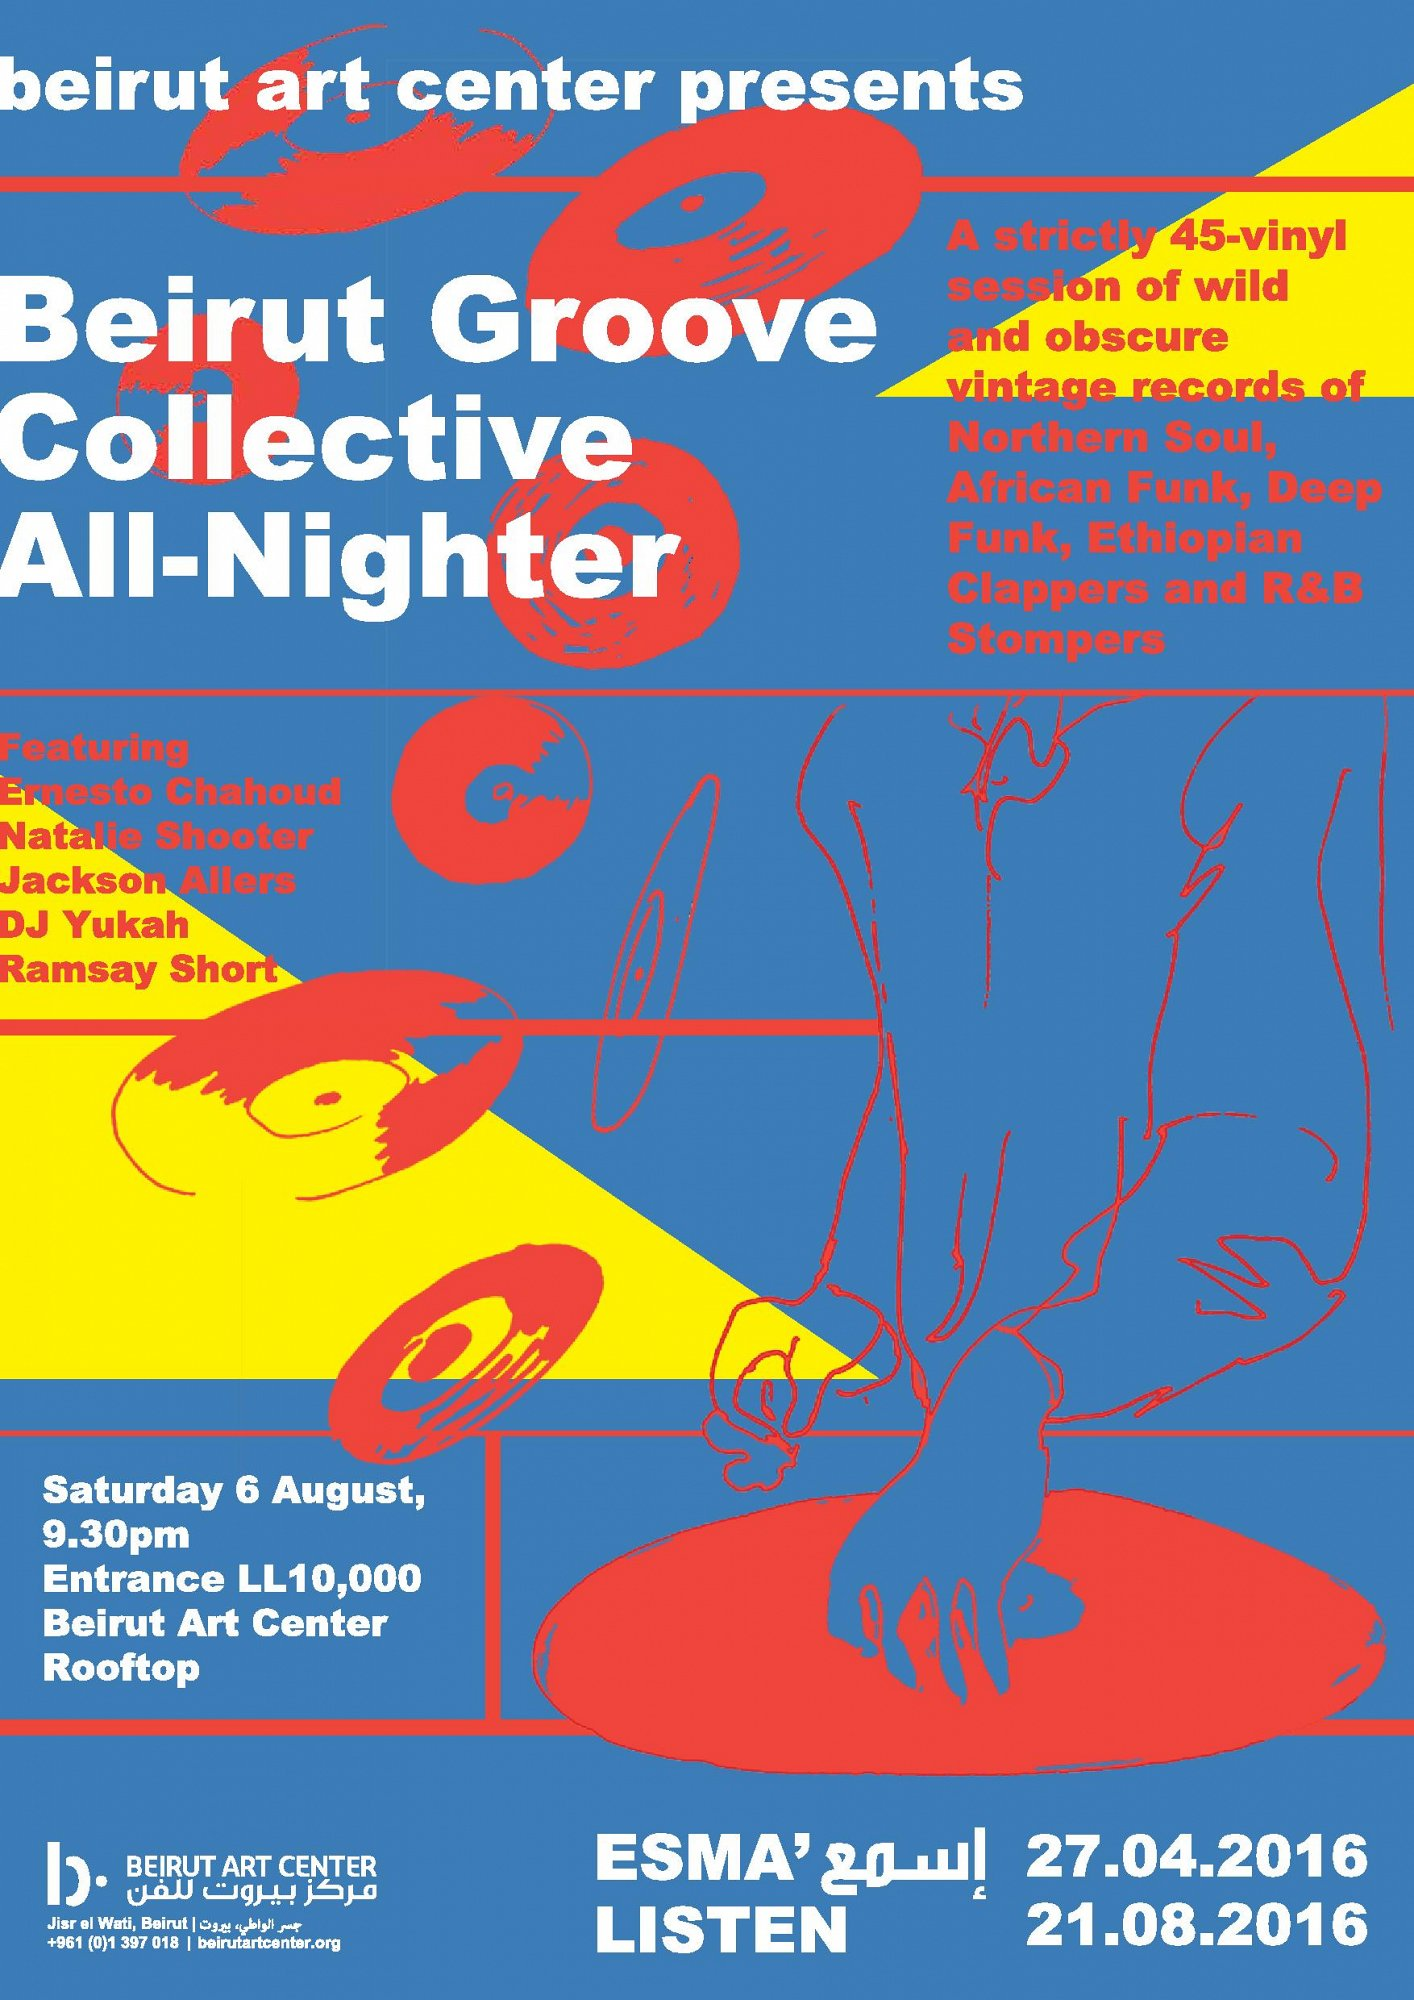 Beirut Art Center presents    Beirut Groove Collective All-Nighter